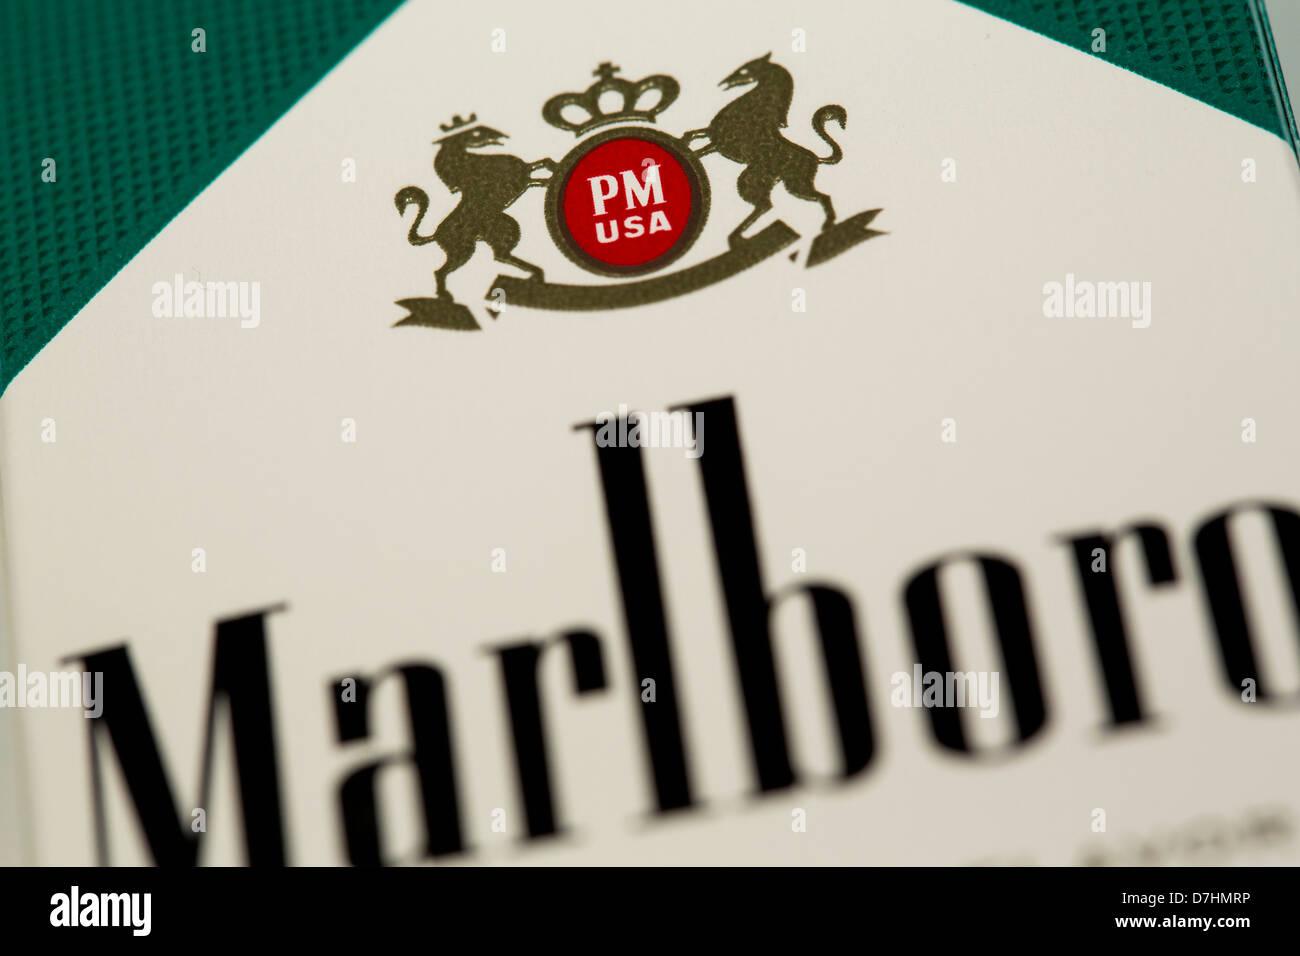 Cigarette prices naples Florida